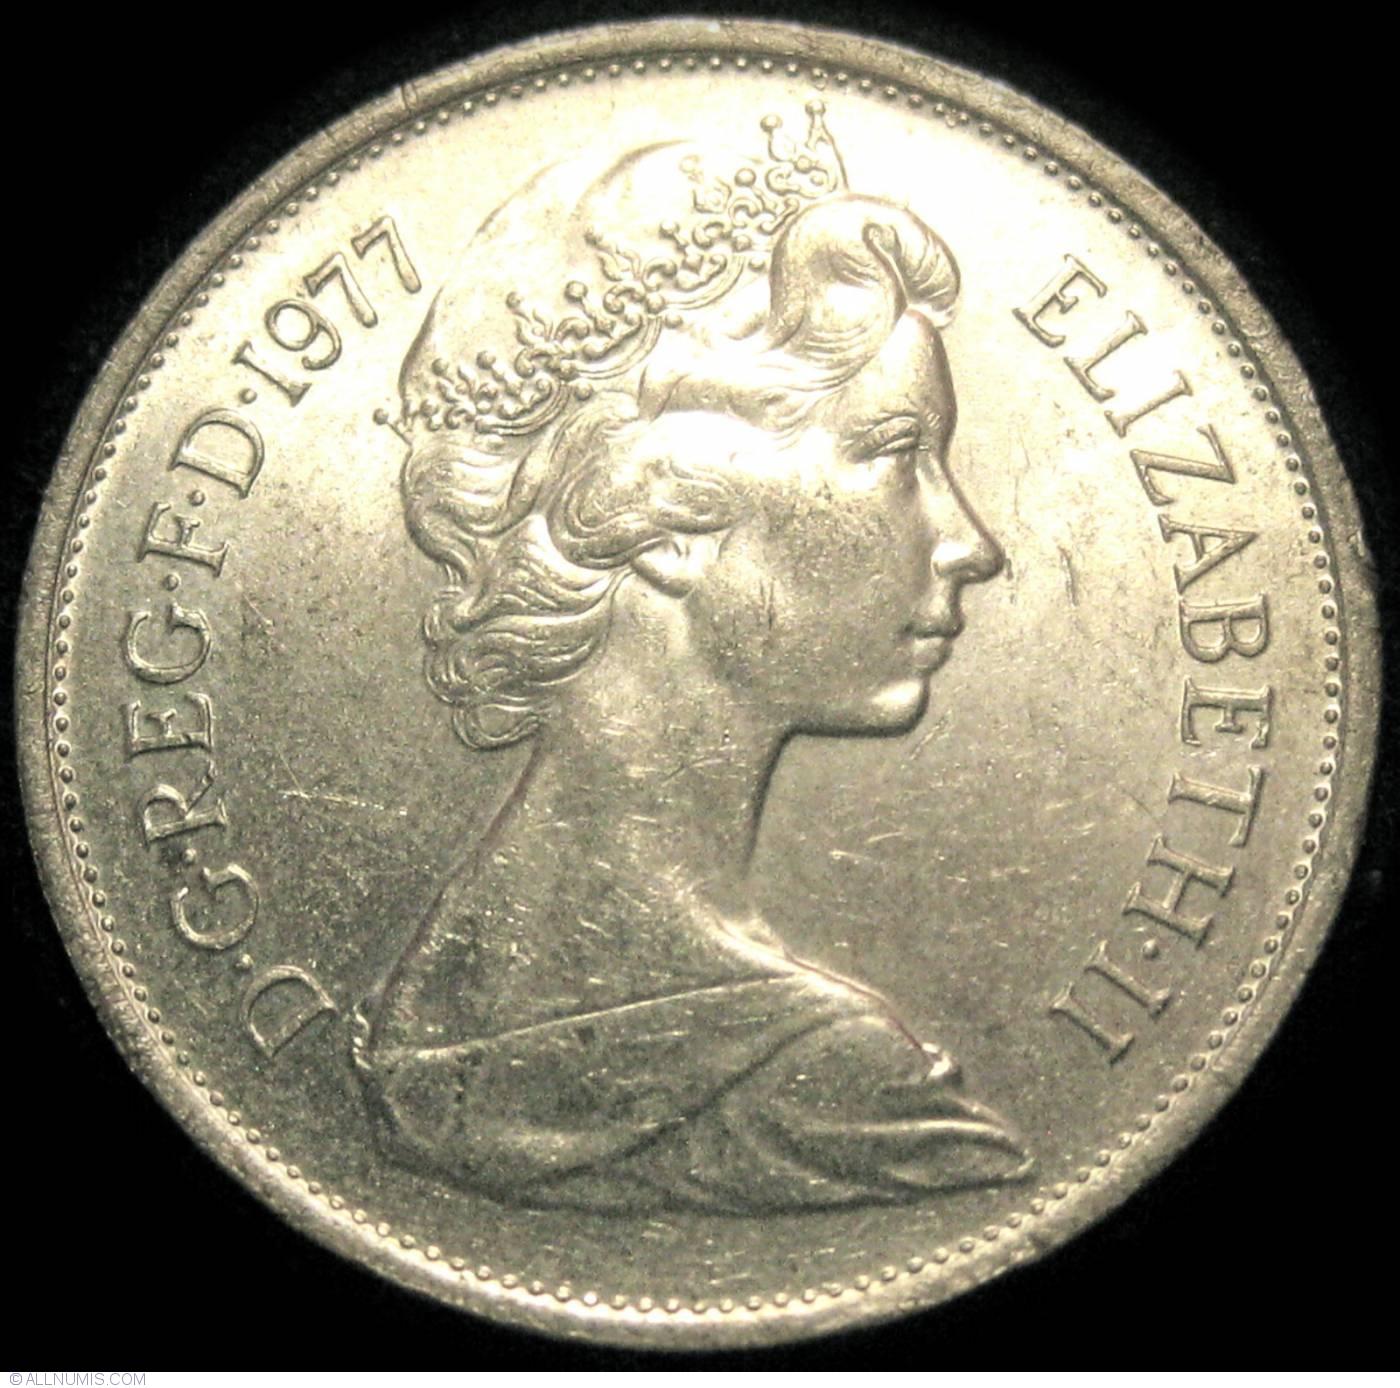 10 New Pence 1977, Elizabeth II (1952-present) - Great Britain